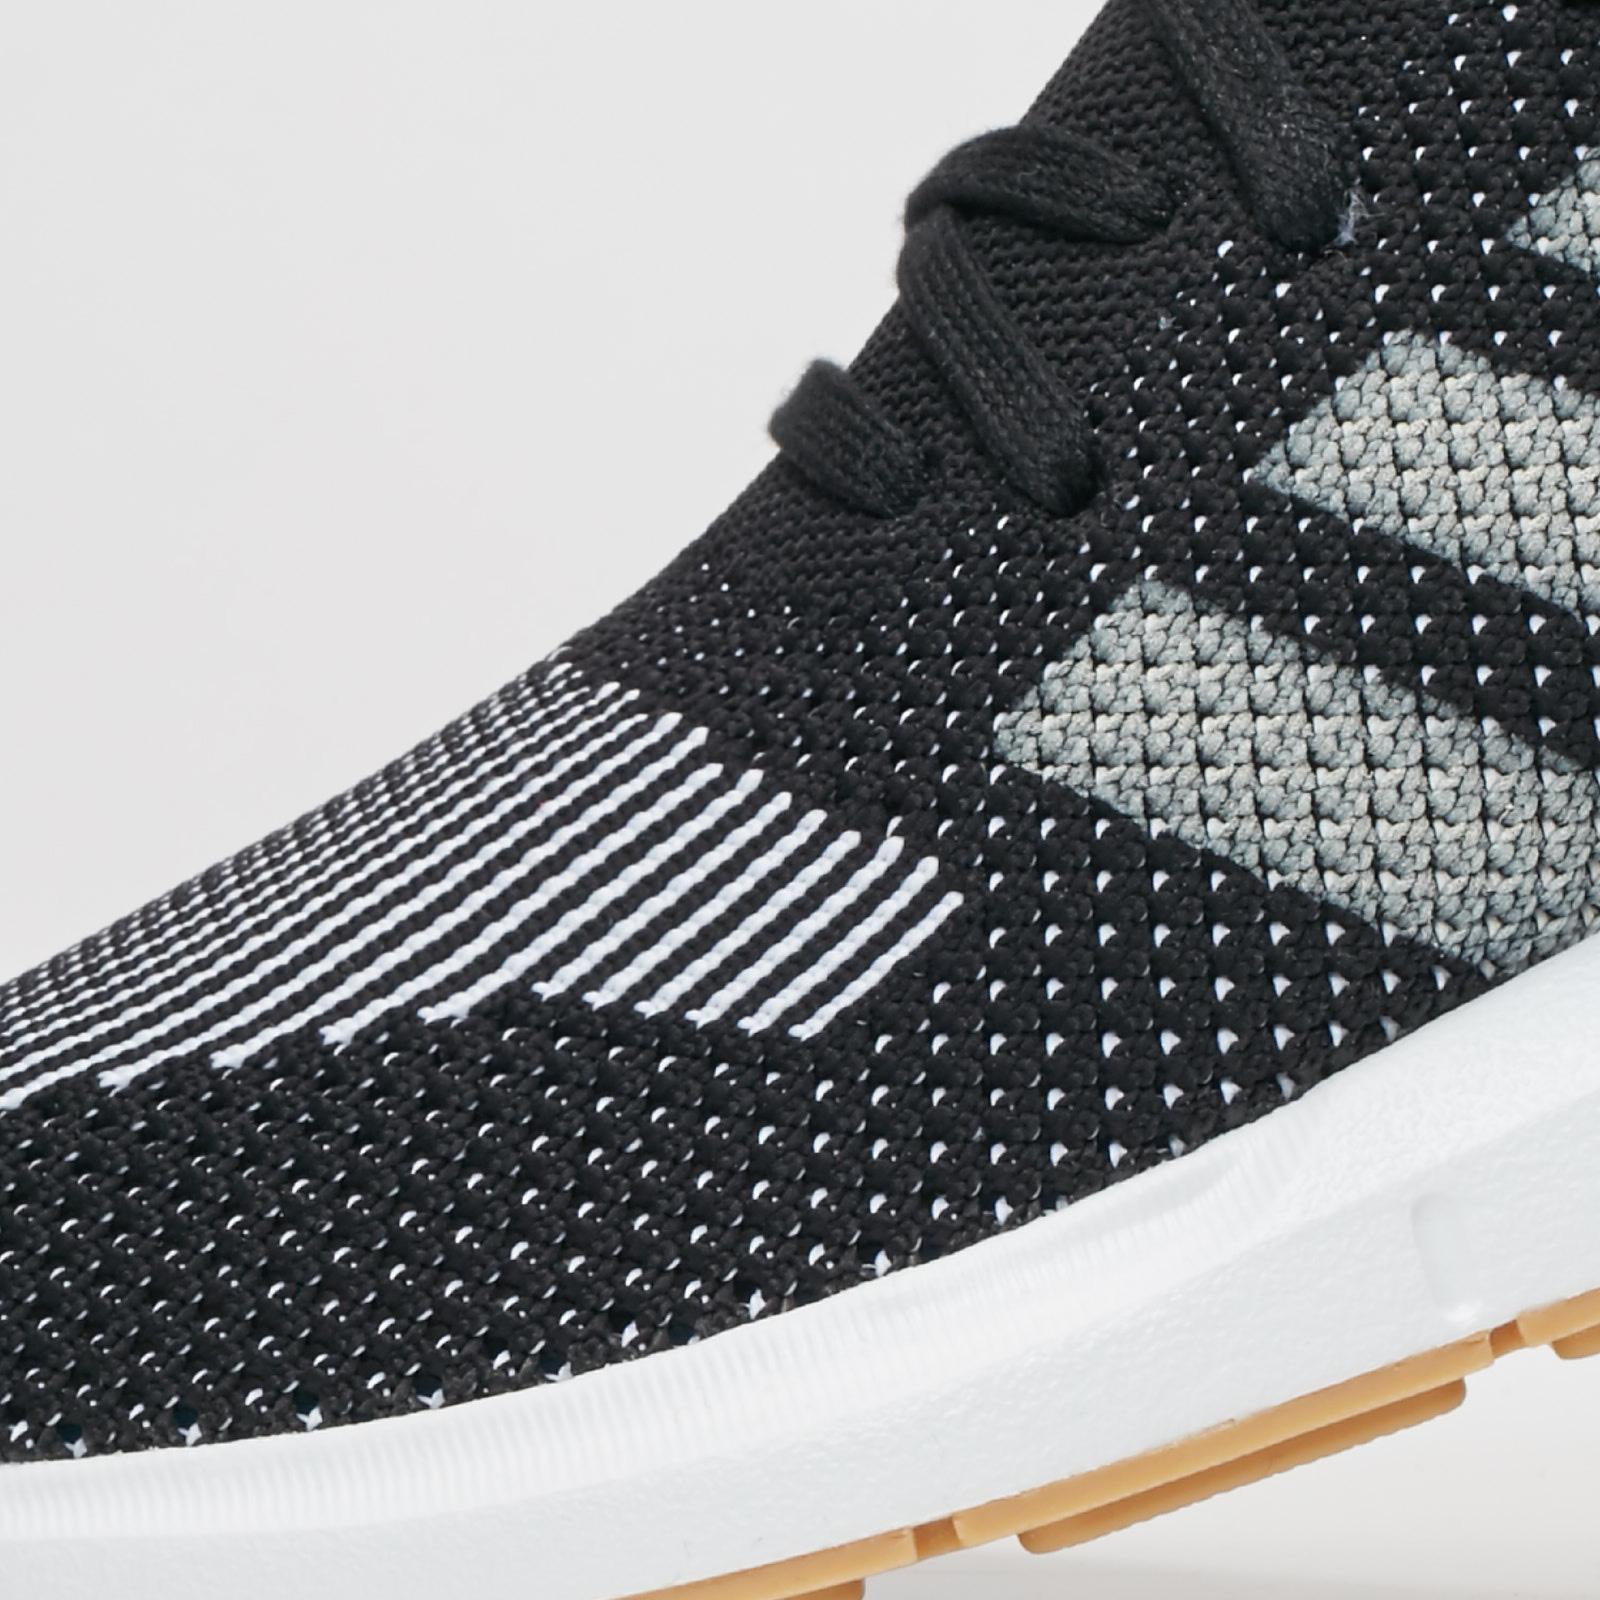 b15c0a2185be9 adidas Swift Run PK - Cq2891 - Sneakersnstuff